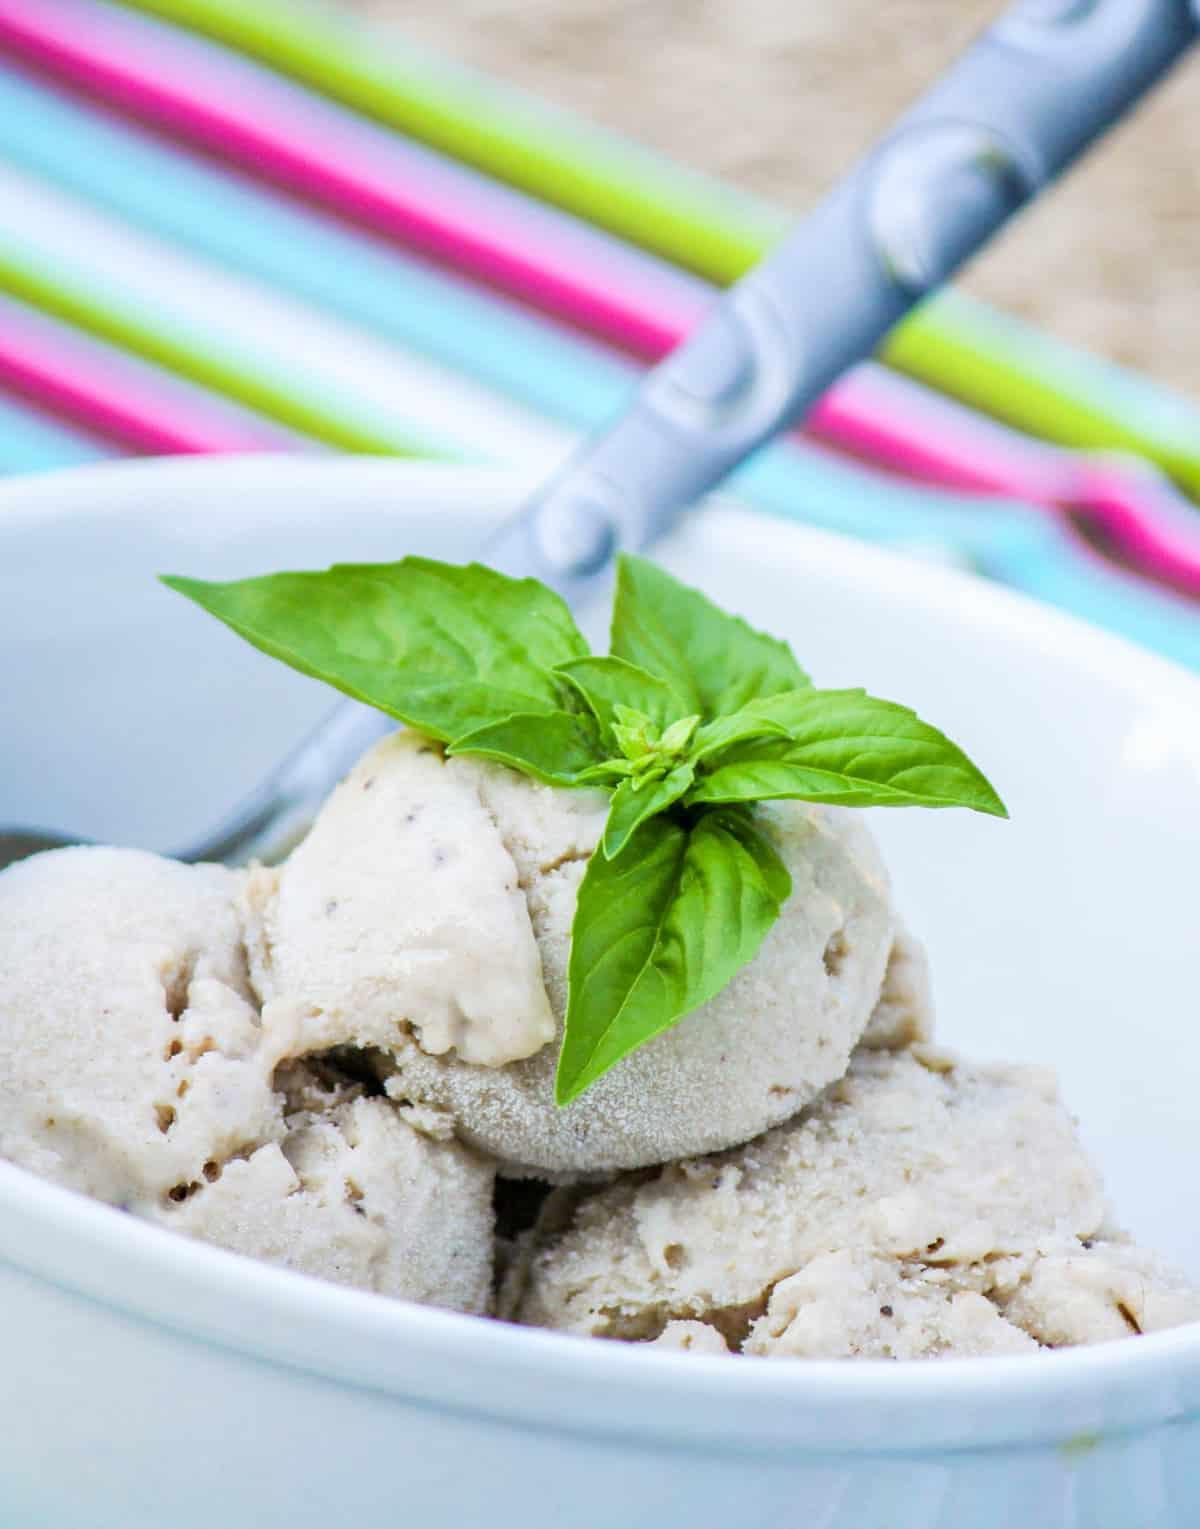 Roasted Banana and Coconut Ice Cream